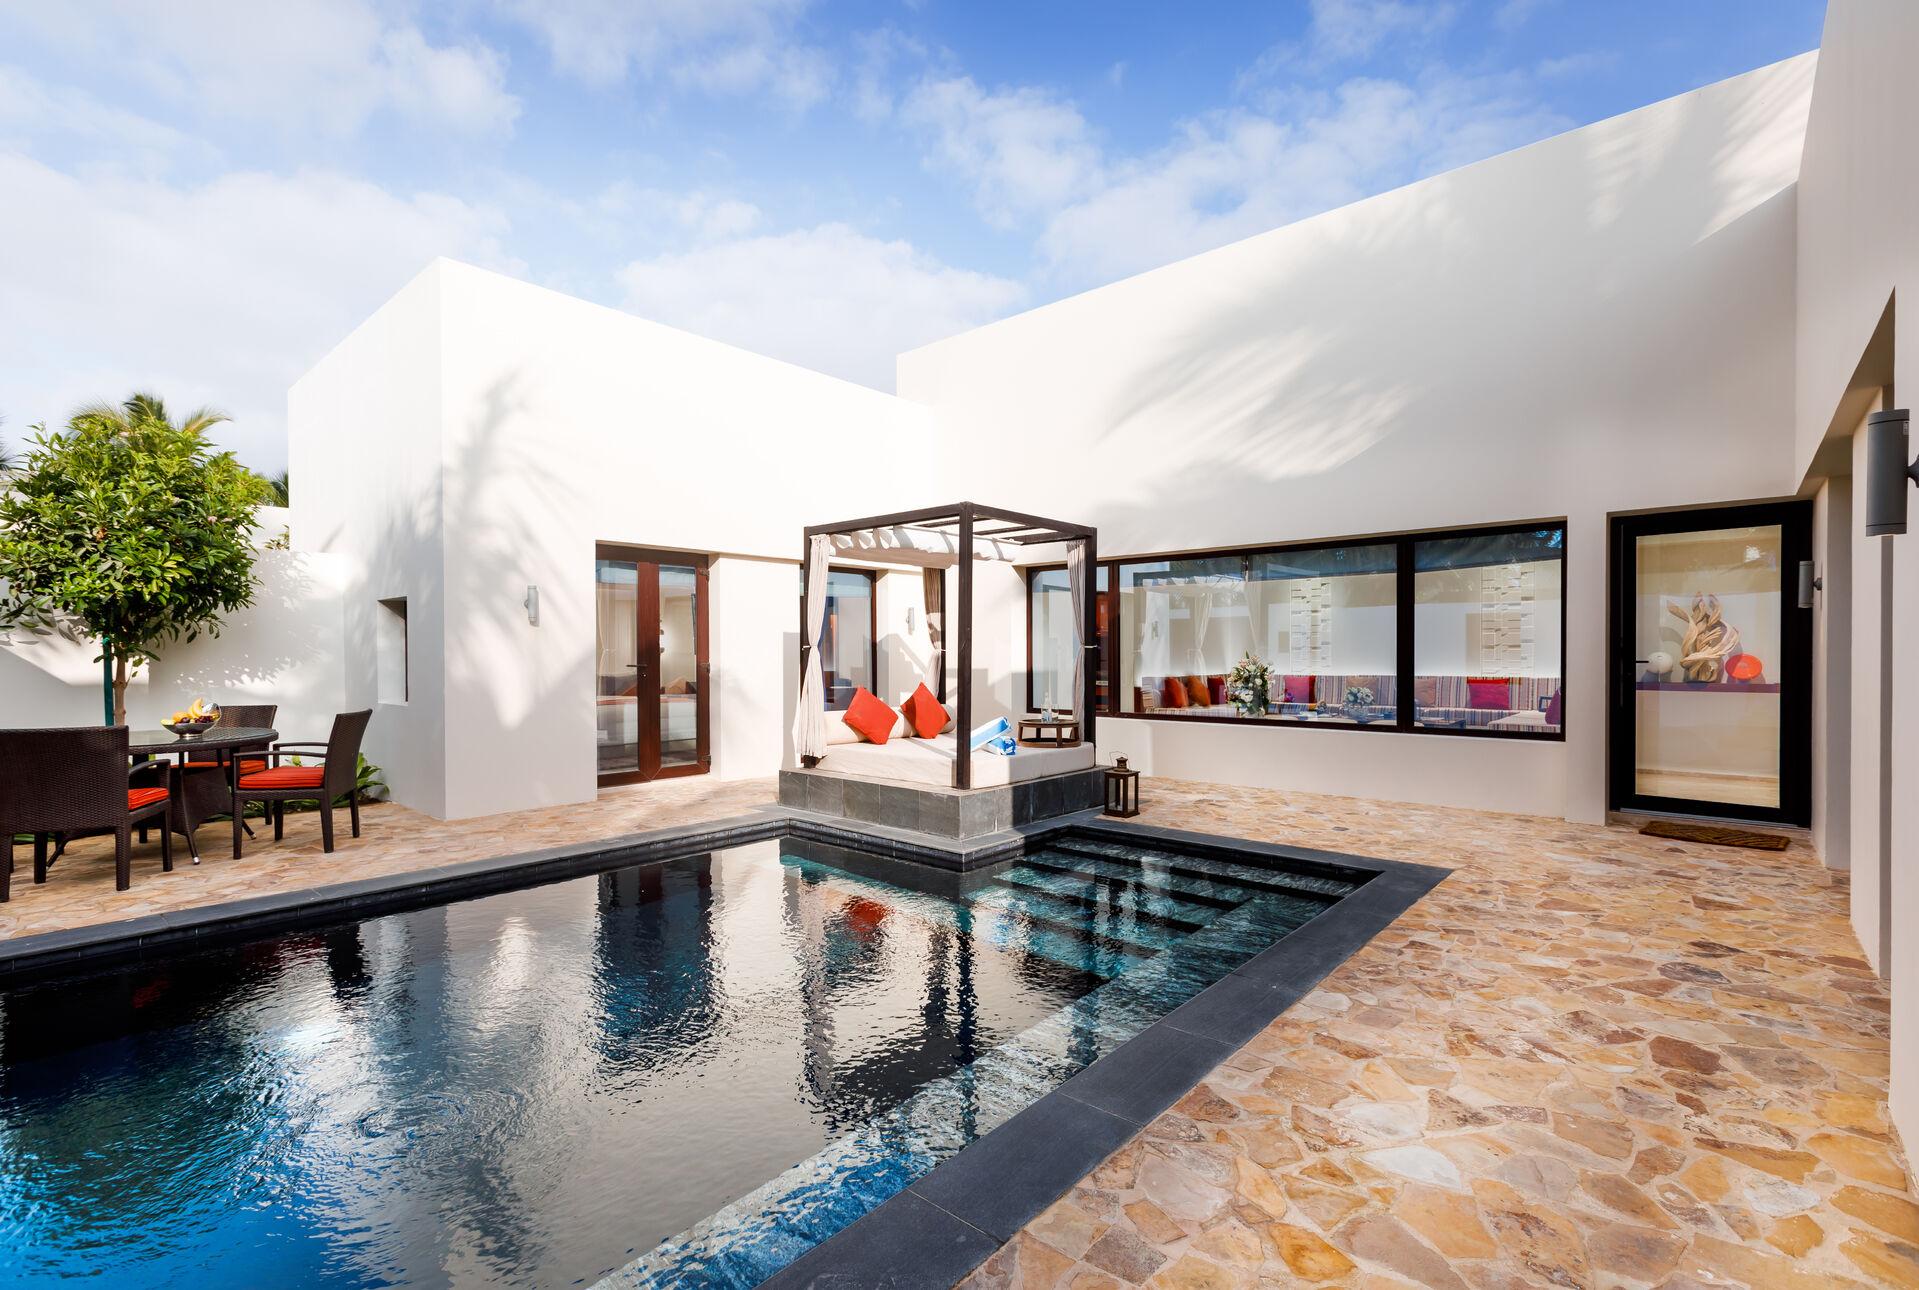 https://cms.satur.sk/data/imgs/tour_image/orig/two-bedroom-garden-view-pool-villa-ext-1939941.jpg